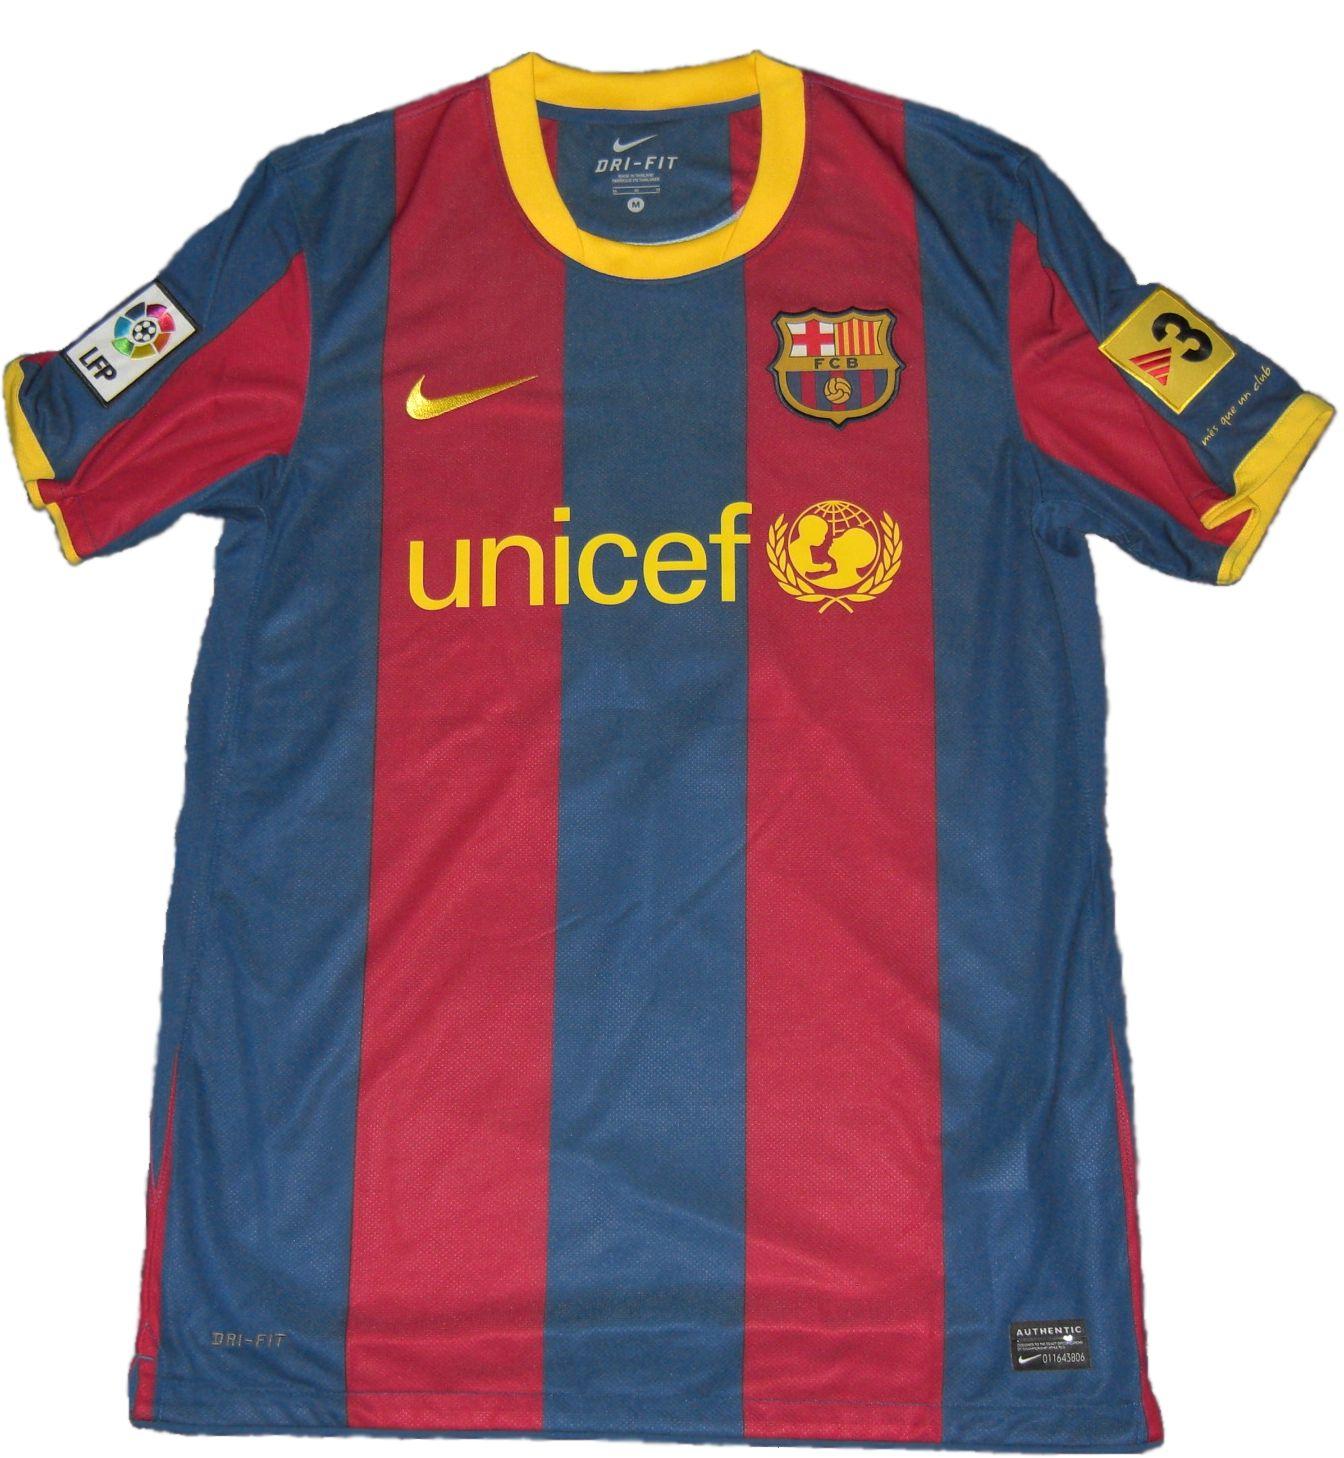 Fichier:FC Barcelona Trikot 2010-11.jpg — Wikipédia